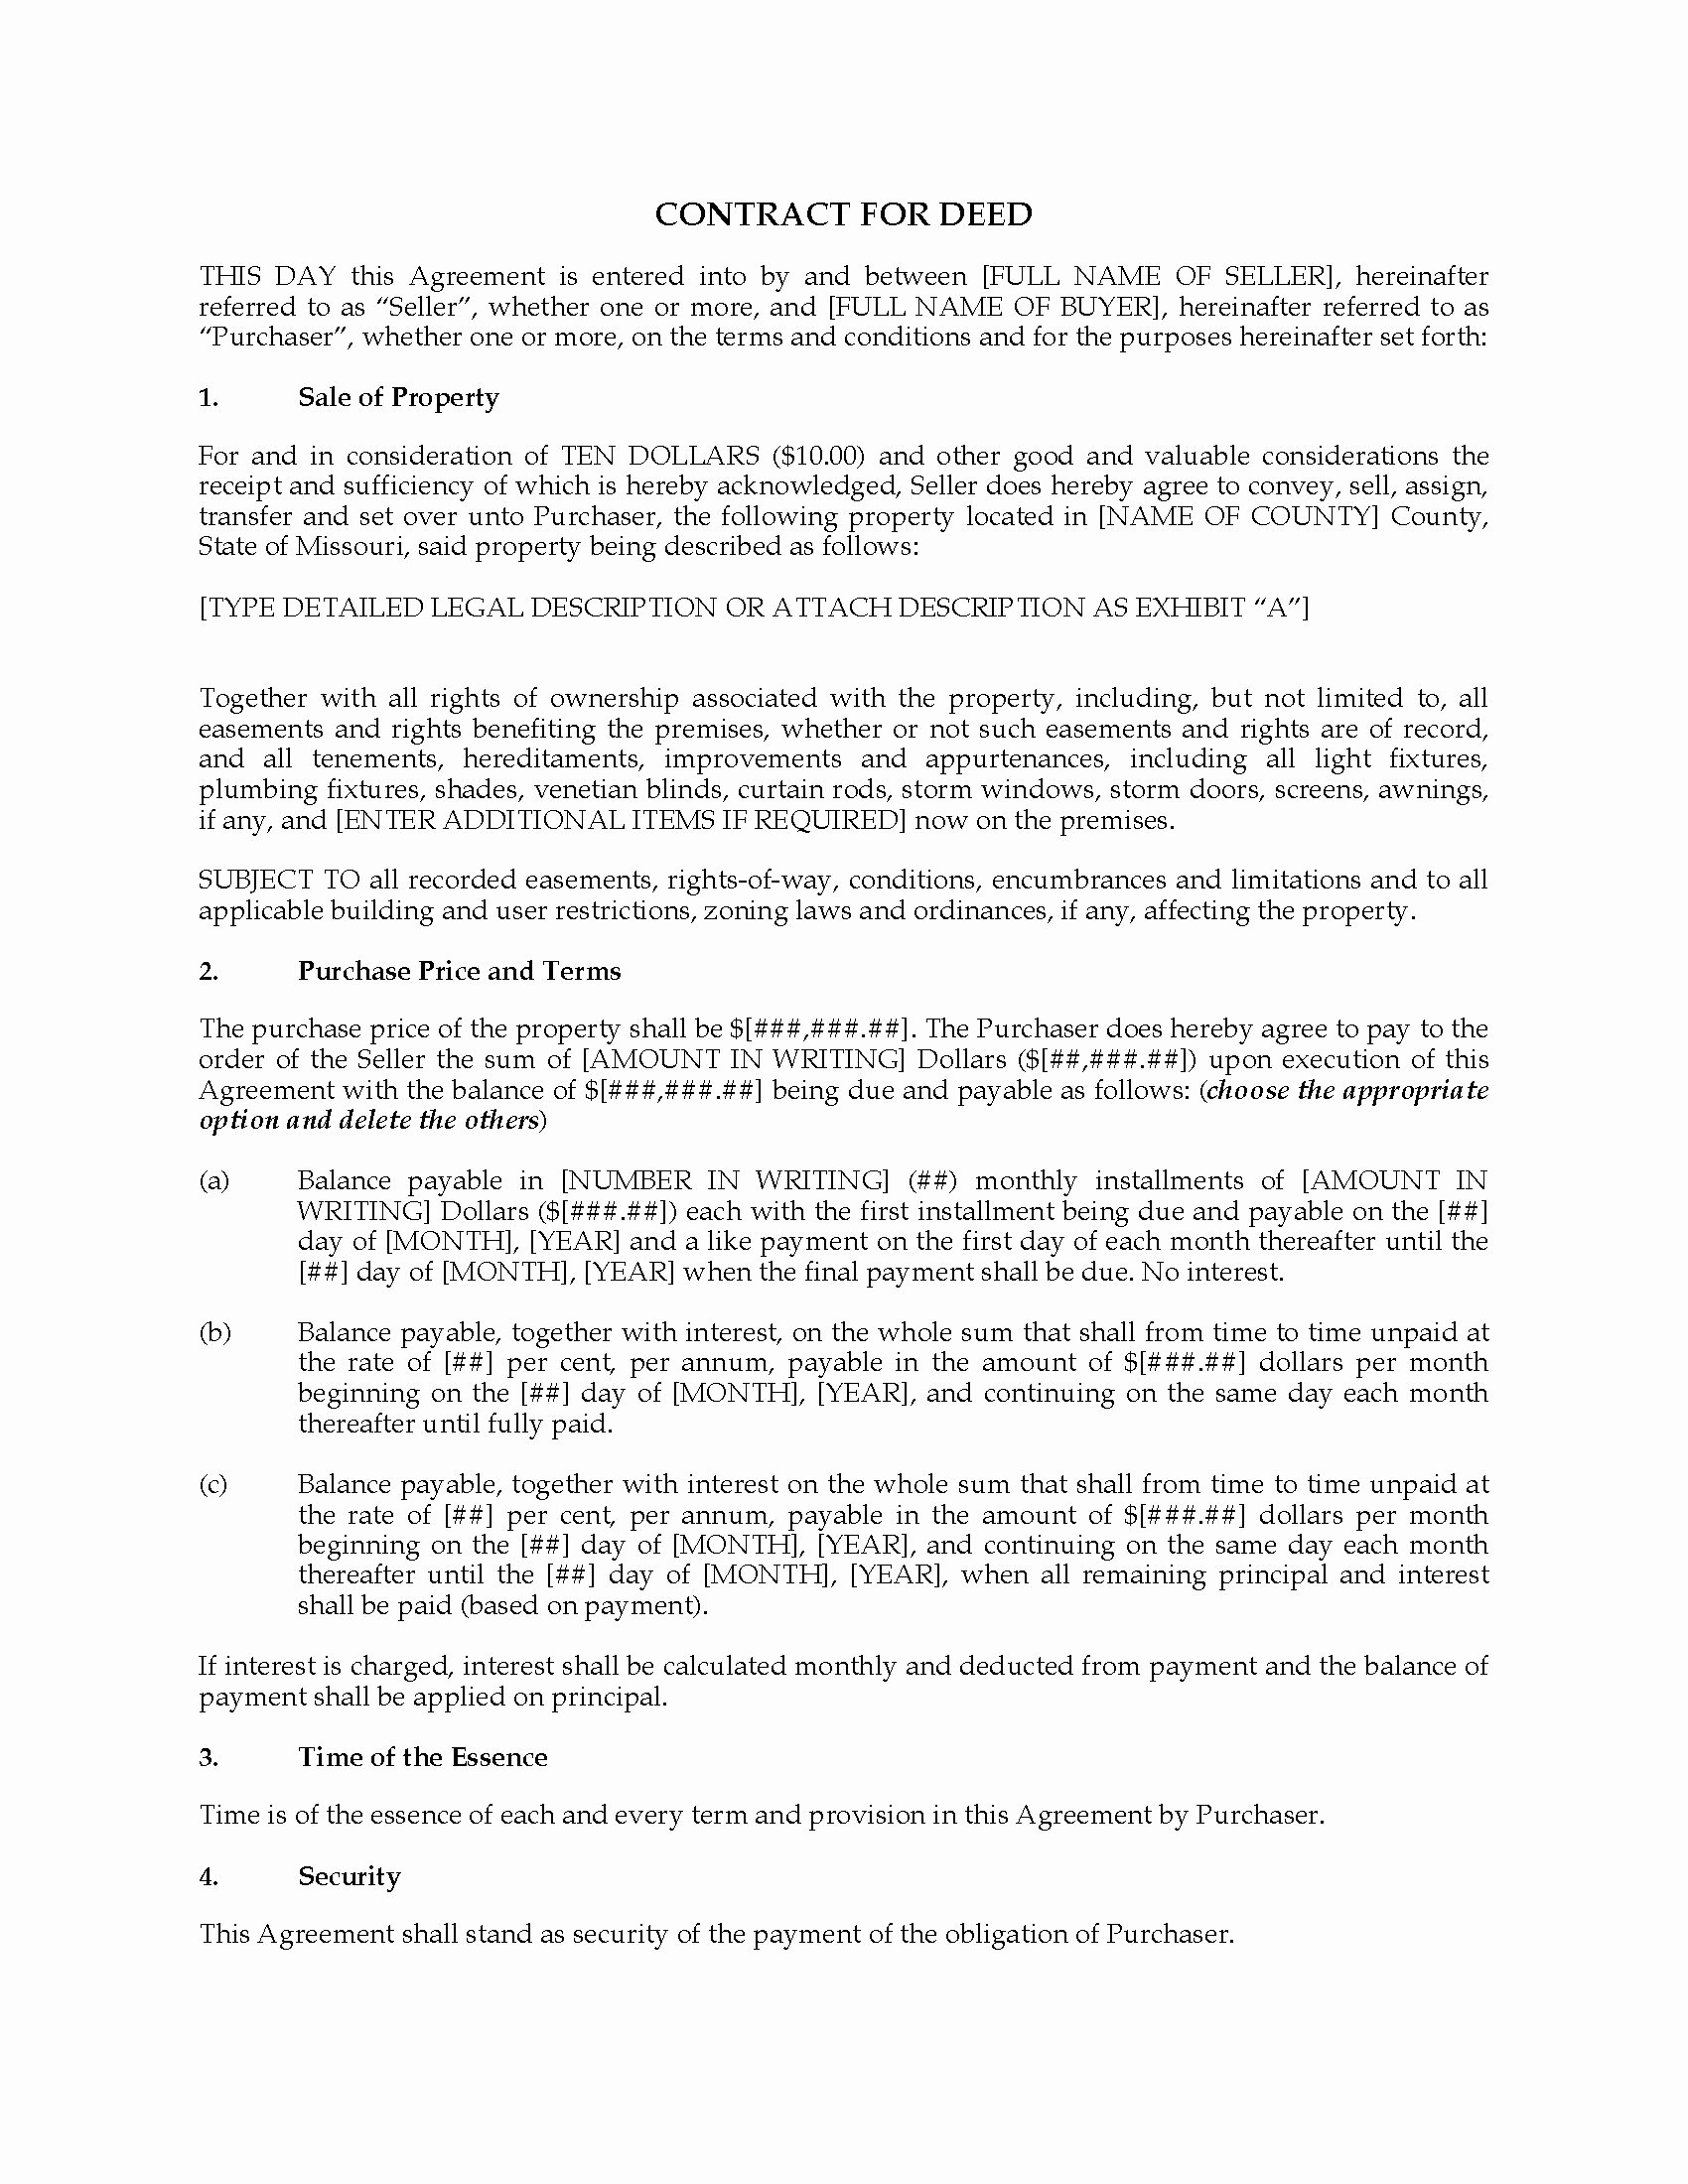 Land Contract Template Ohio Unique Missouri Contract for Deed